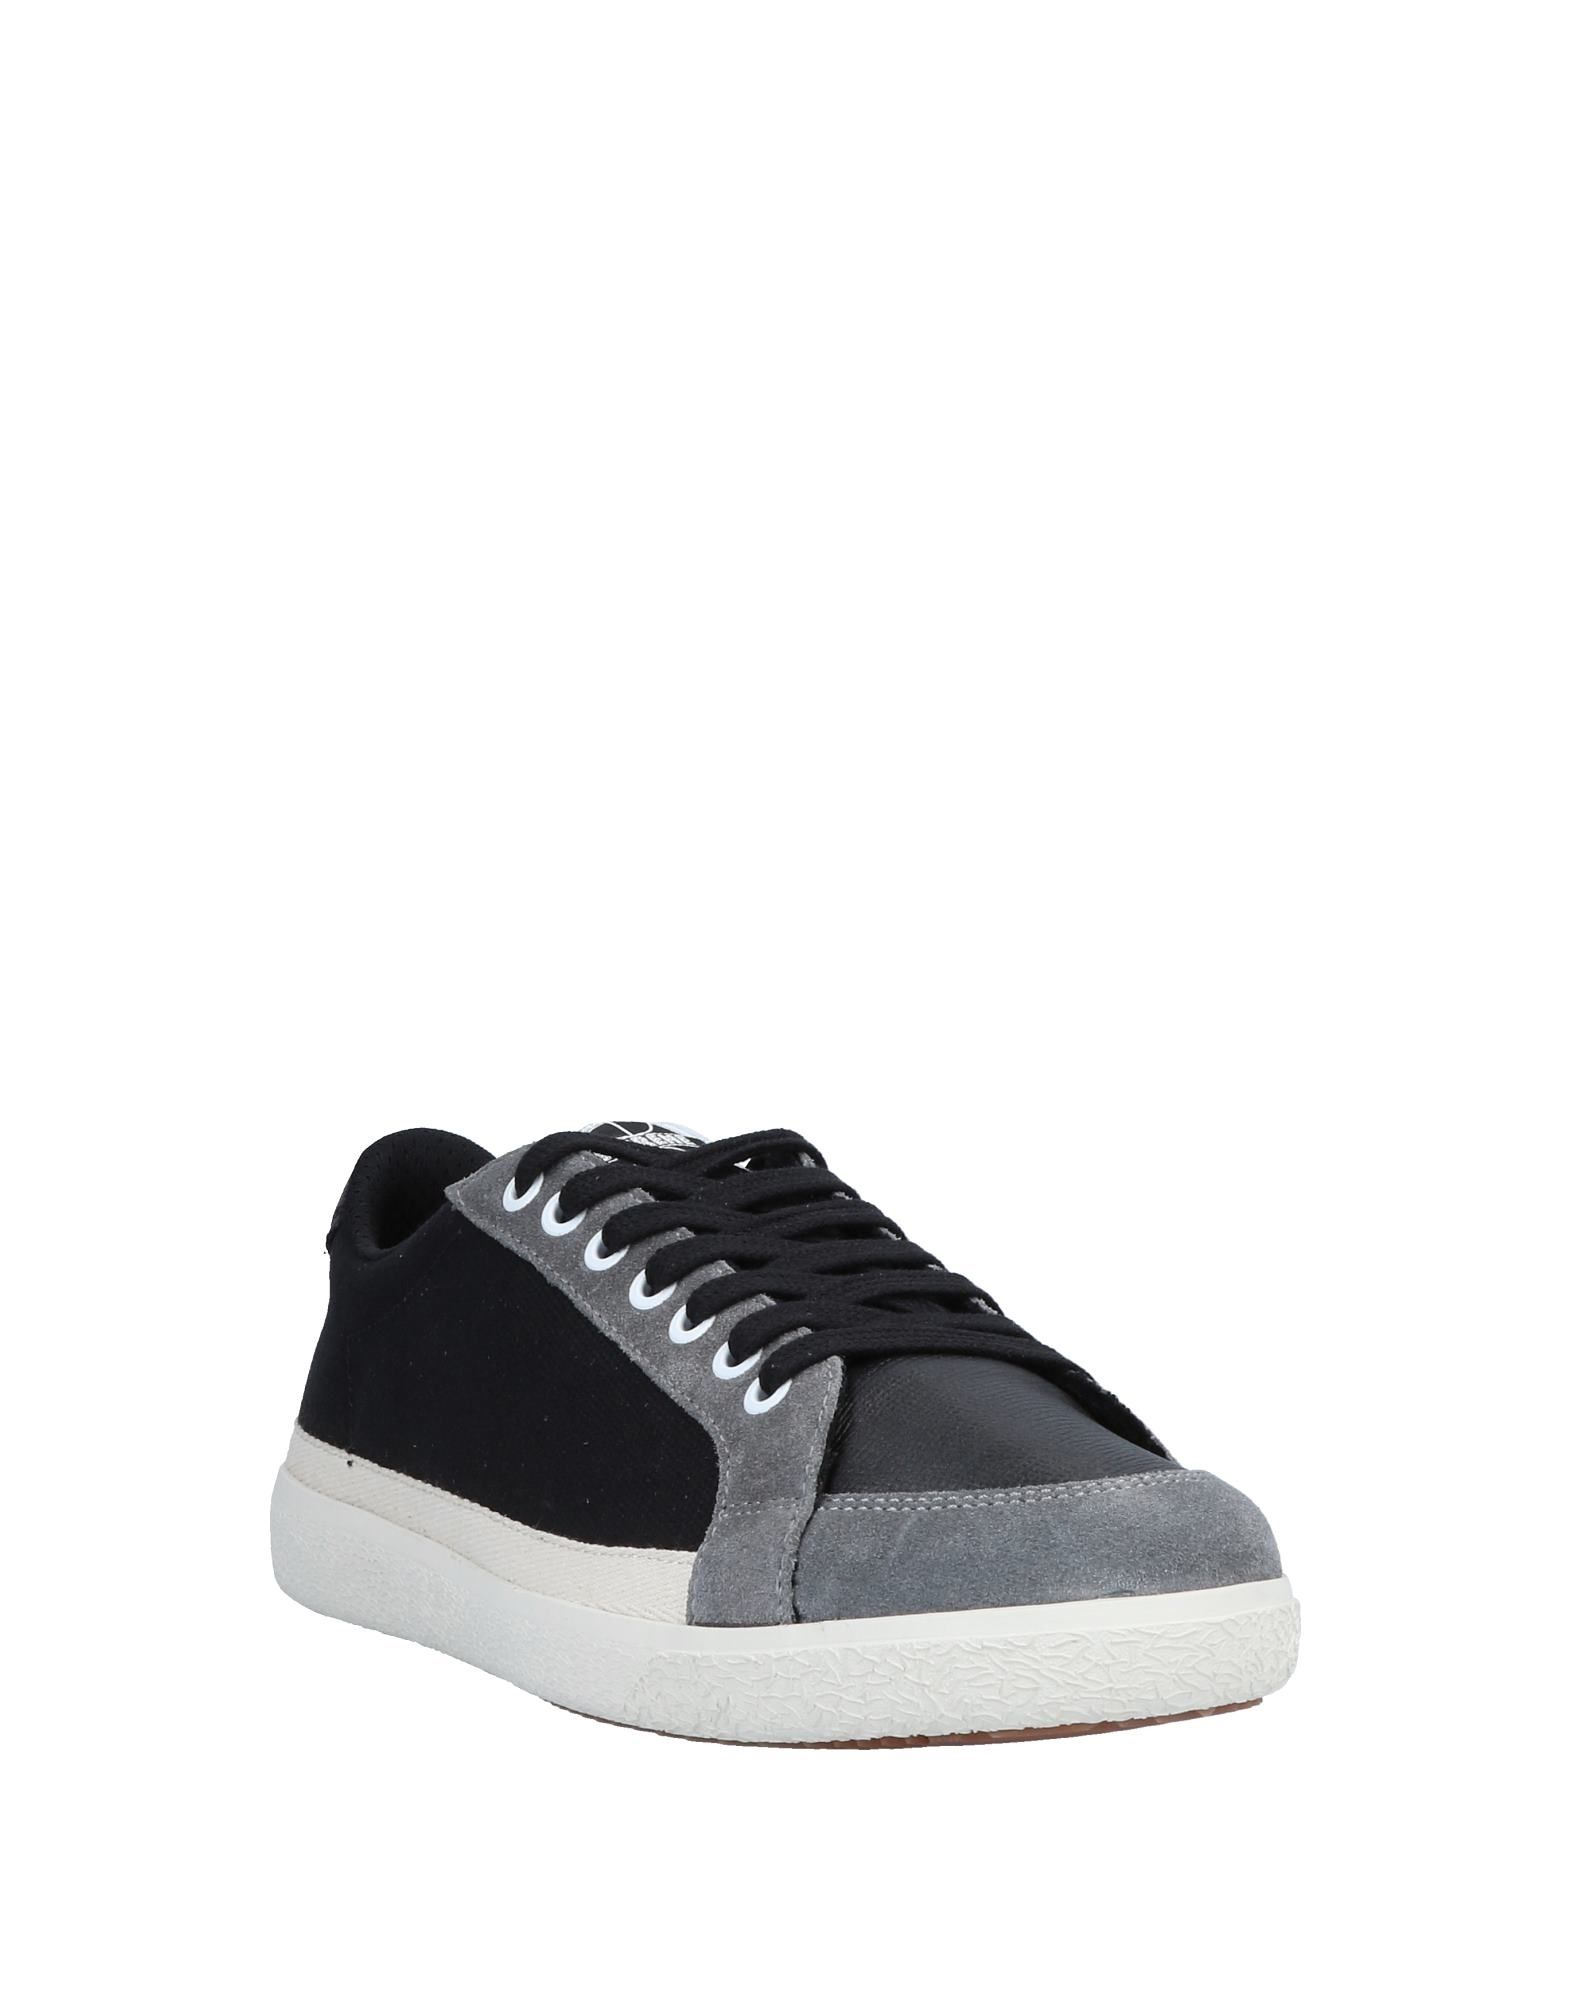 Pantofola Pantofola Pantofola D'oro Sneakers Herren Gutes Preis-Leistungs-Verhältnis, es lohnt sich 9dfde0